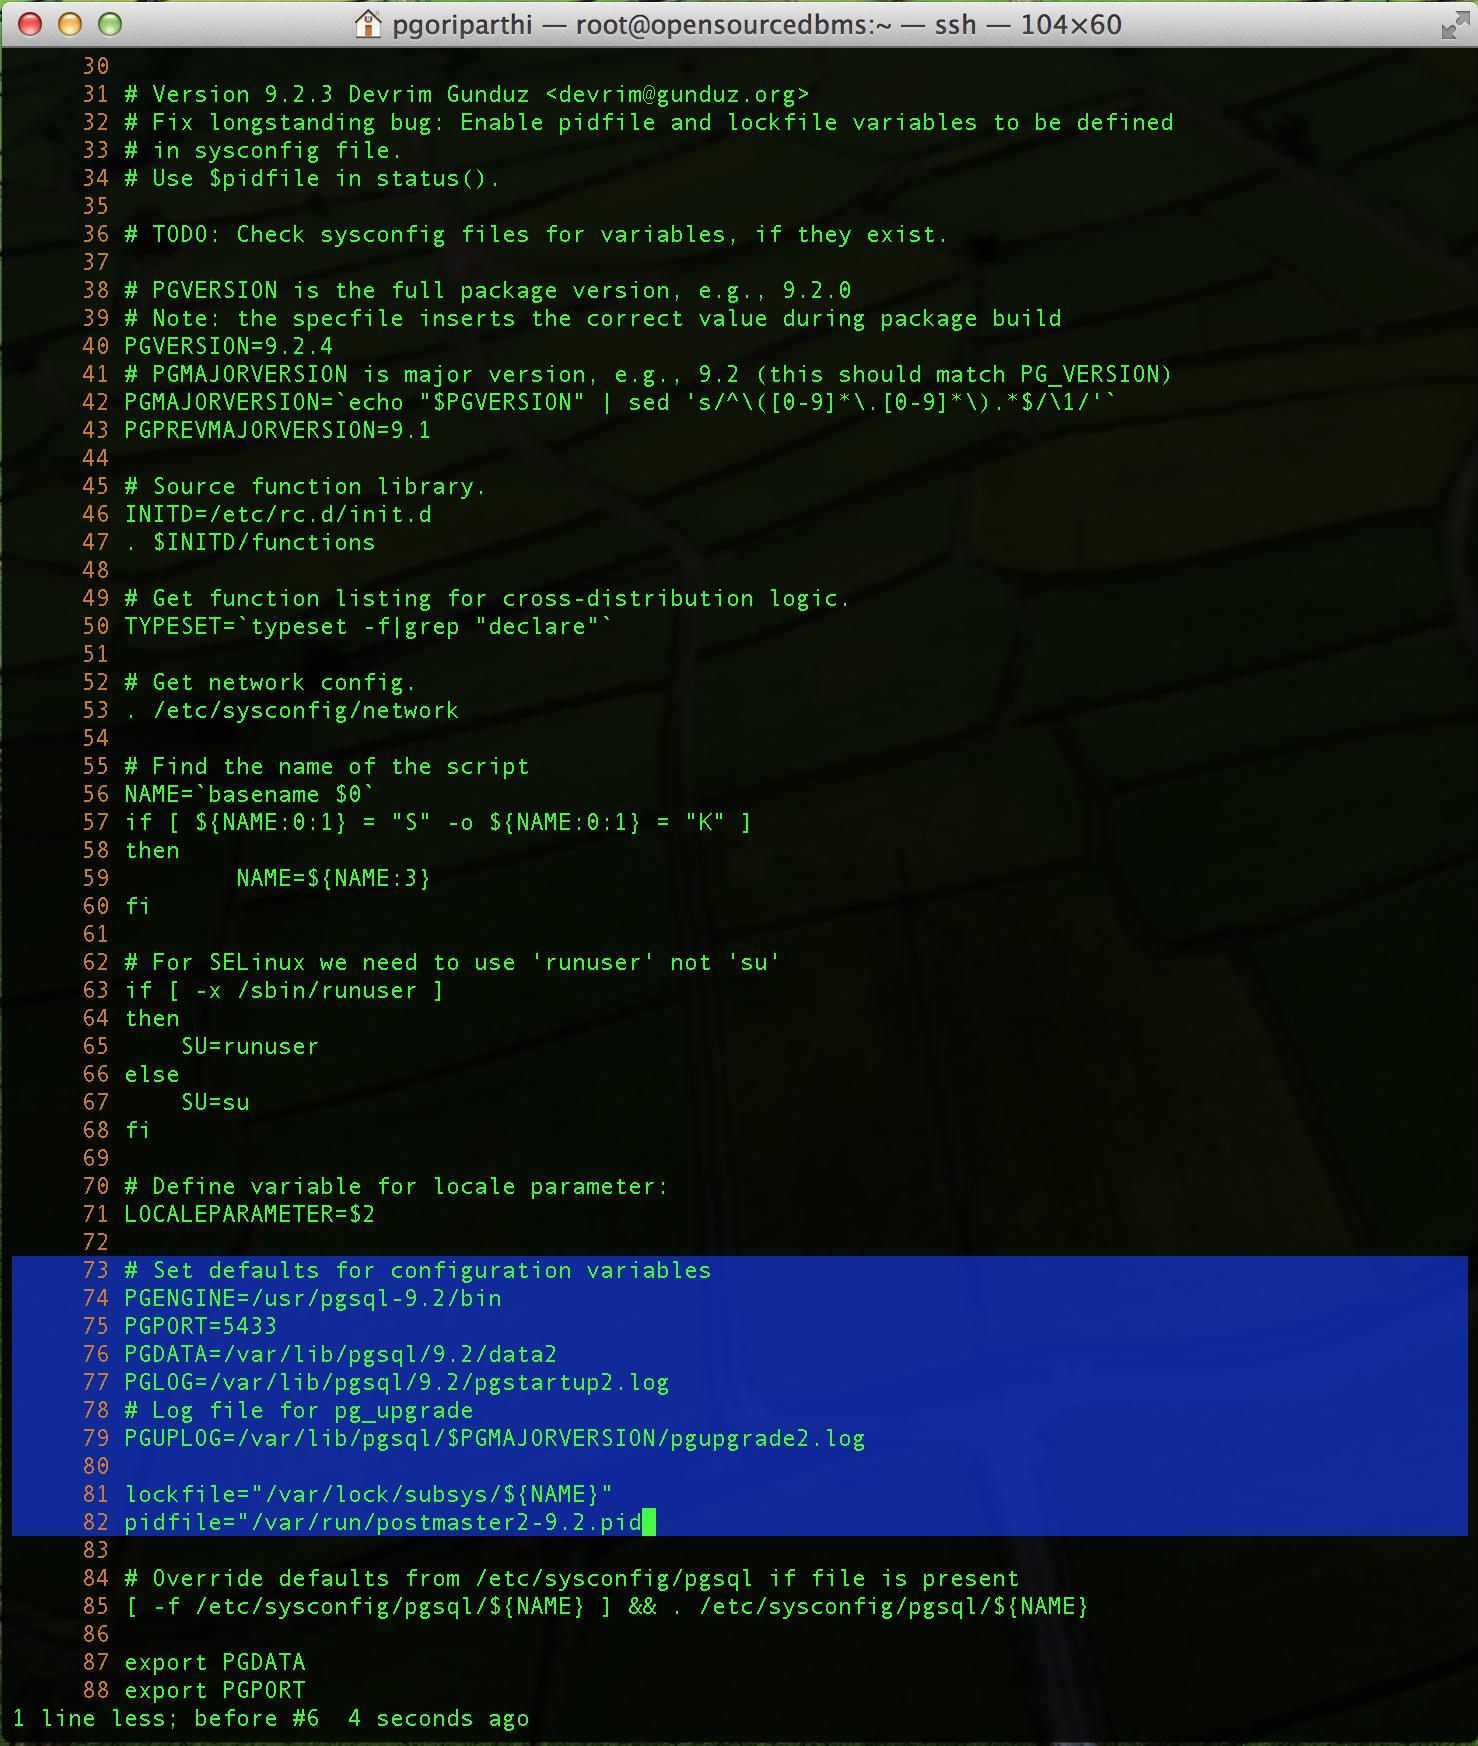 Running multiple PostgreSQL 9 2 Instances on CentOS 6/RHEL 6/Fedora